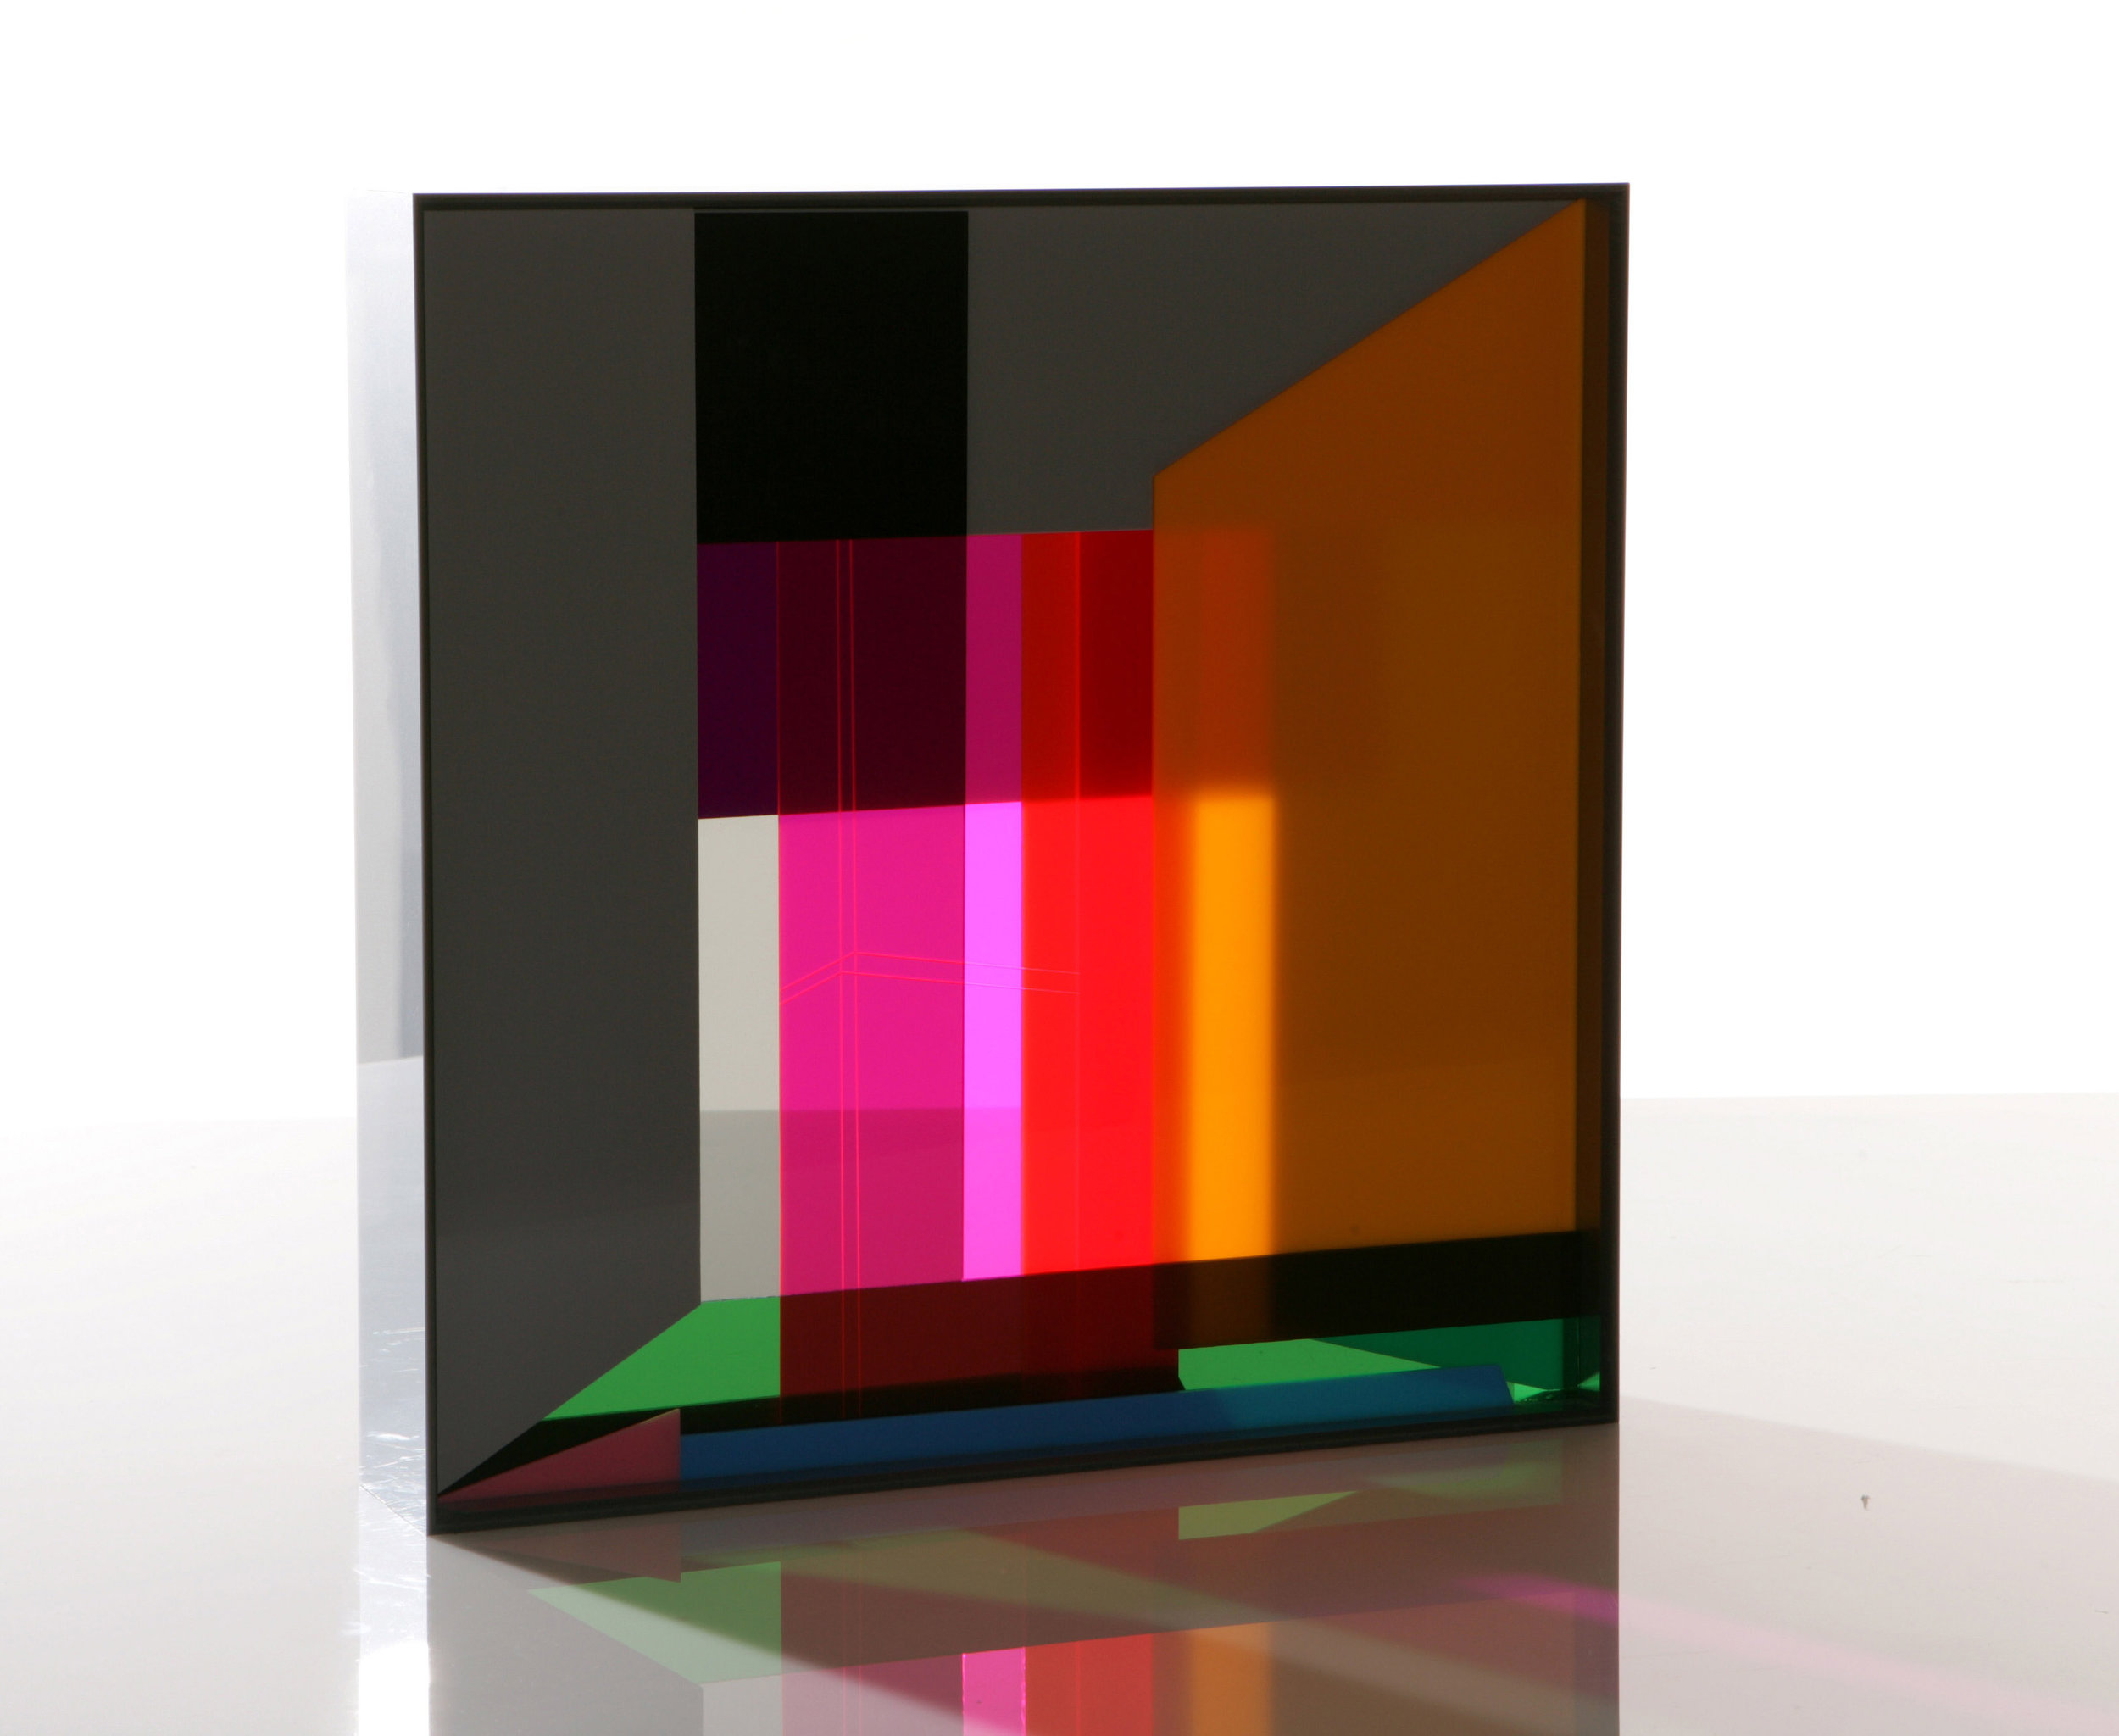 002 Teal Curtain-2-2013.jpg